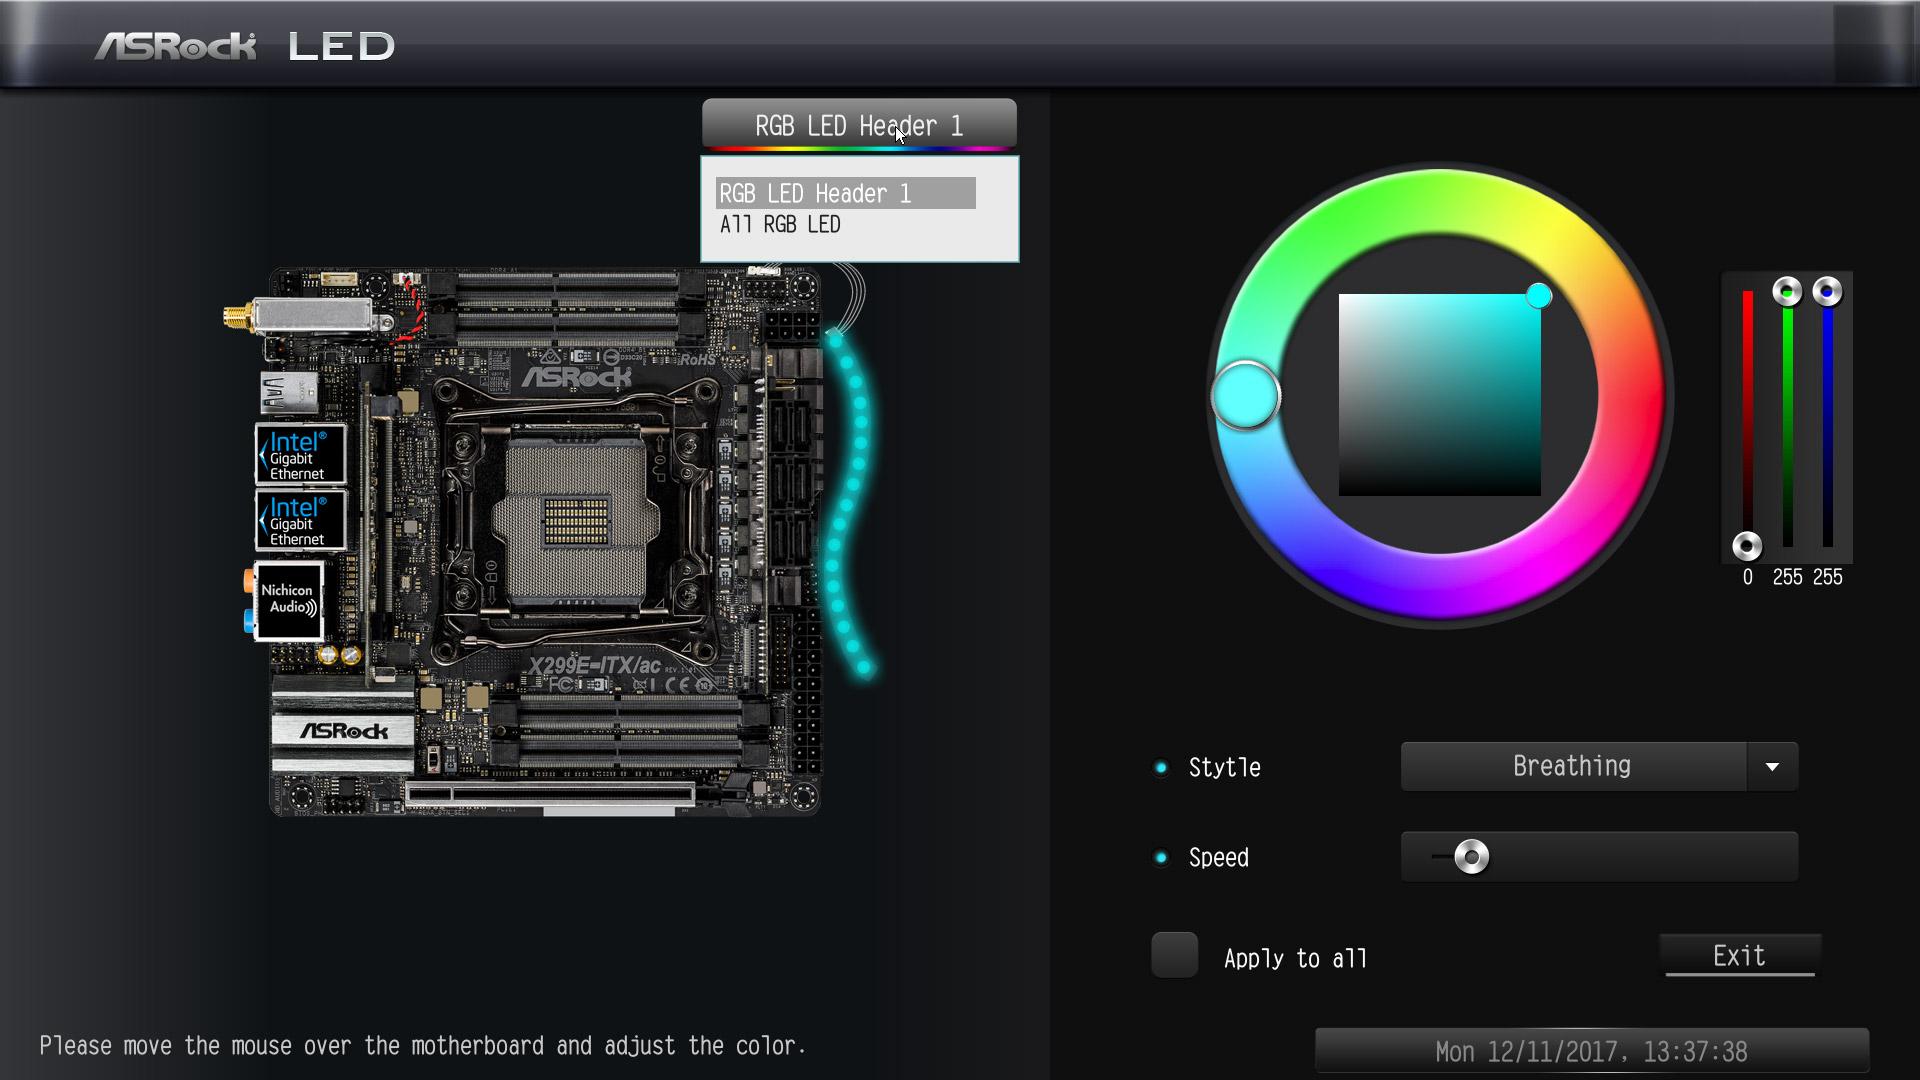 ASRock X299E-ITX/ac Intel LGA 2066 Motherboard Review Layout